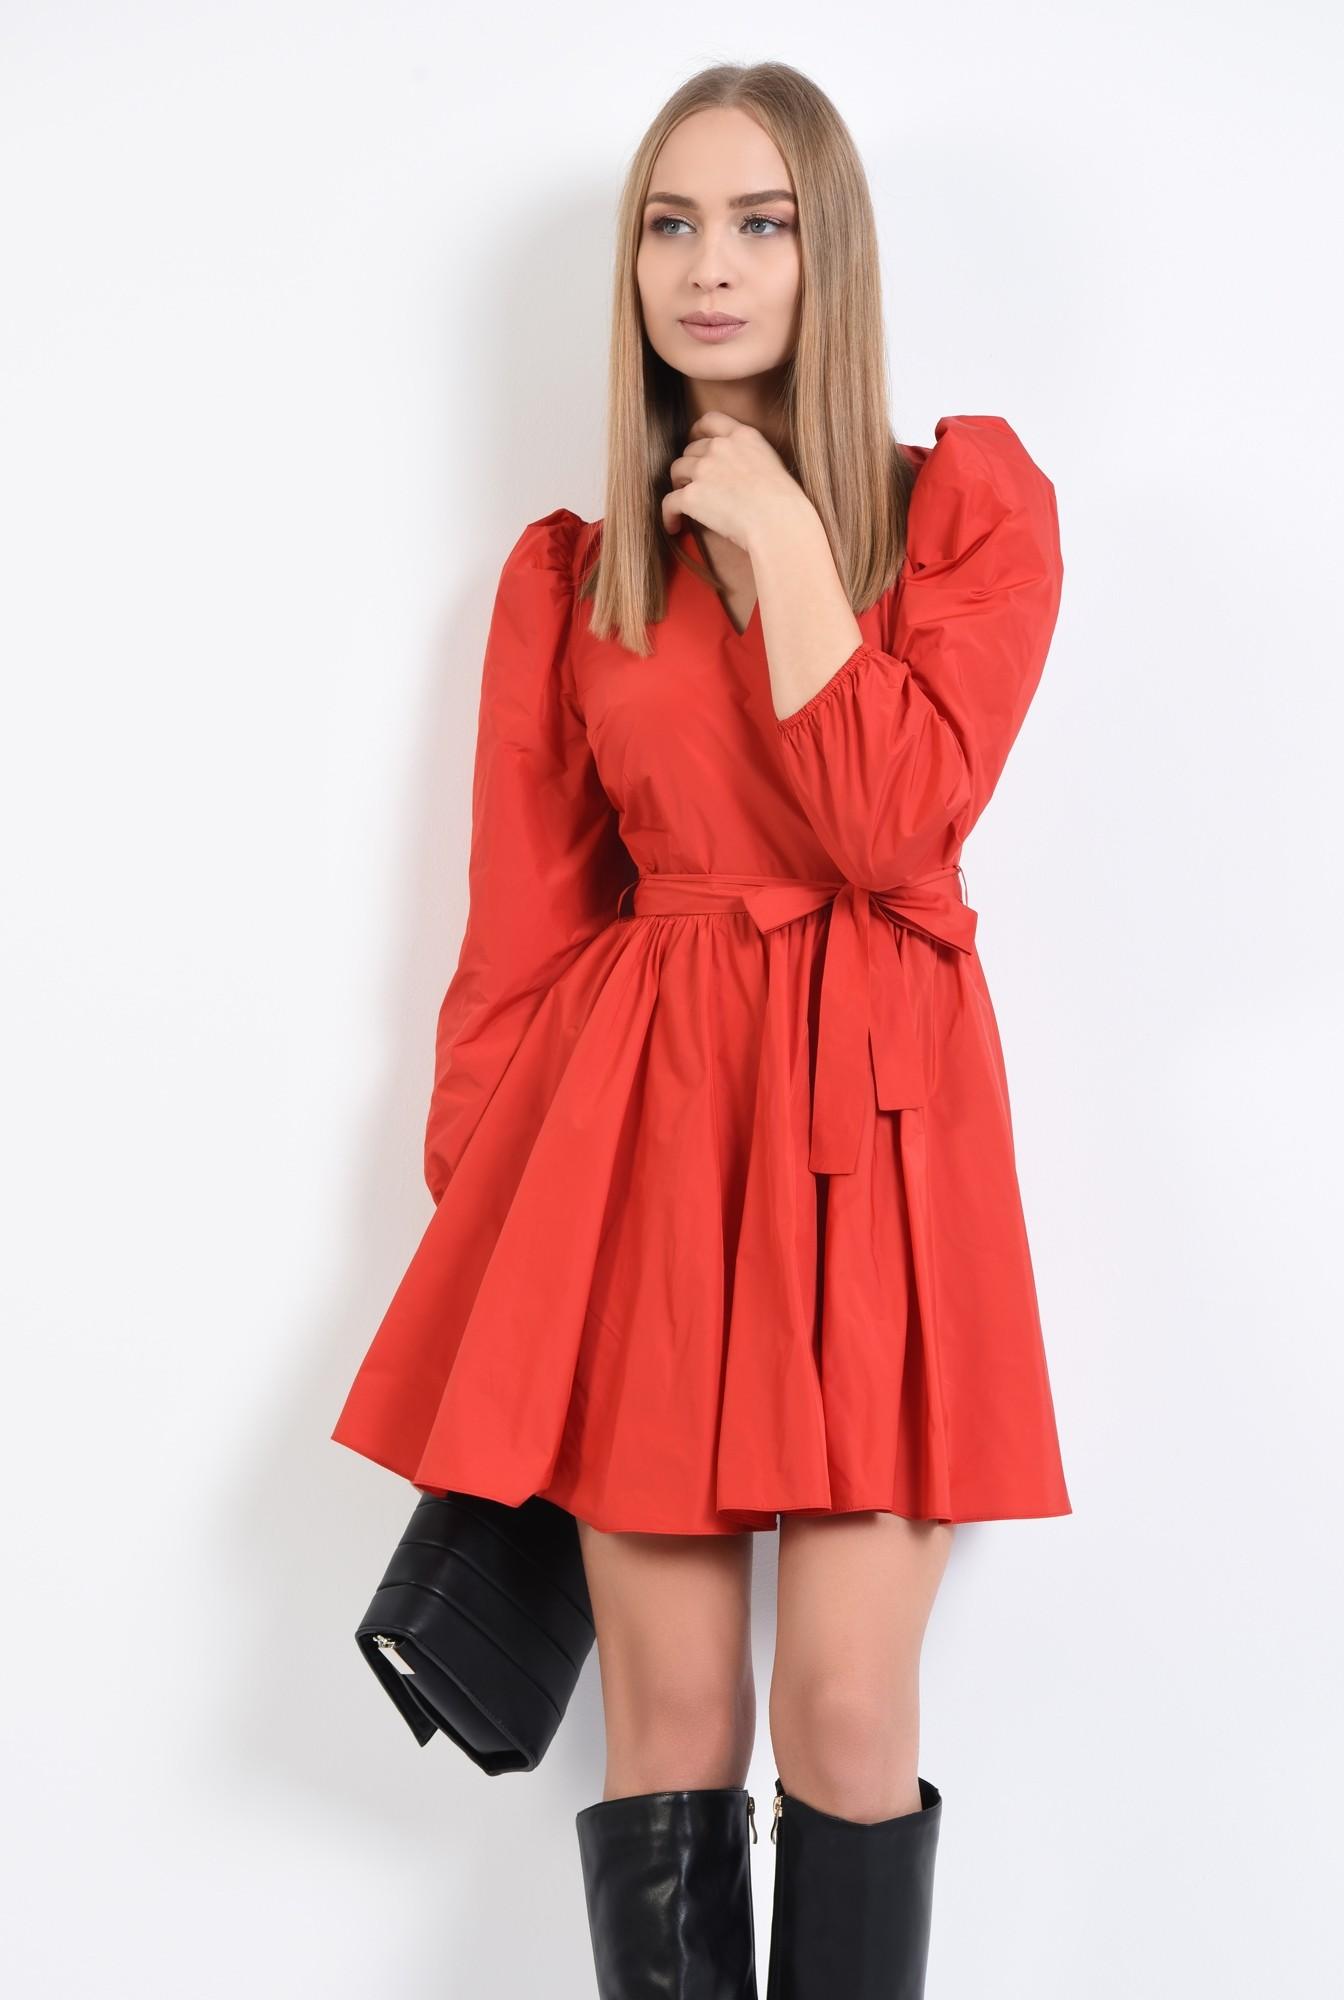 0 - 360 - rochie de zi, rosie, aspect sifonat, croi clos